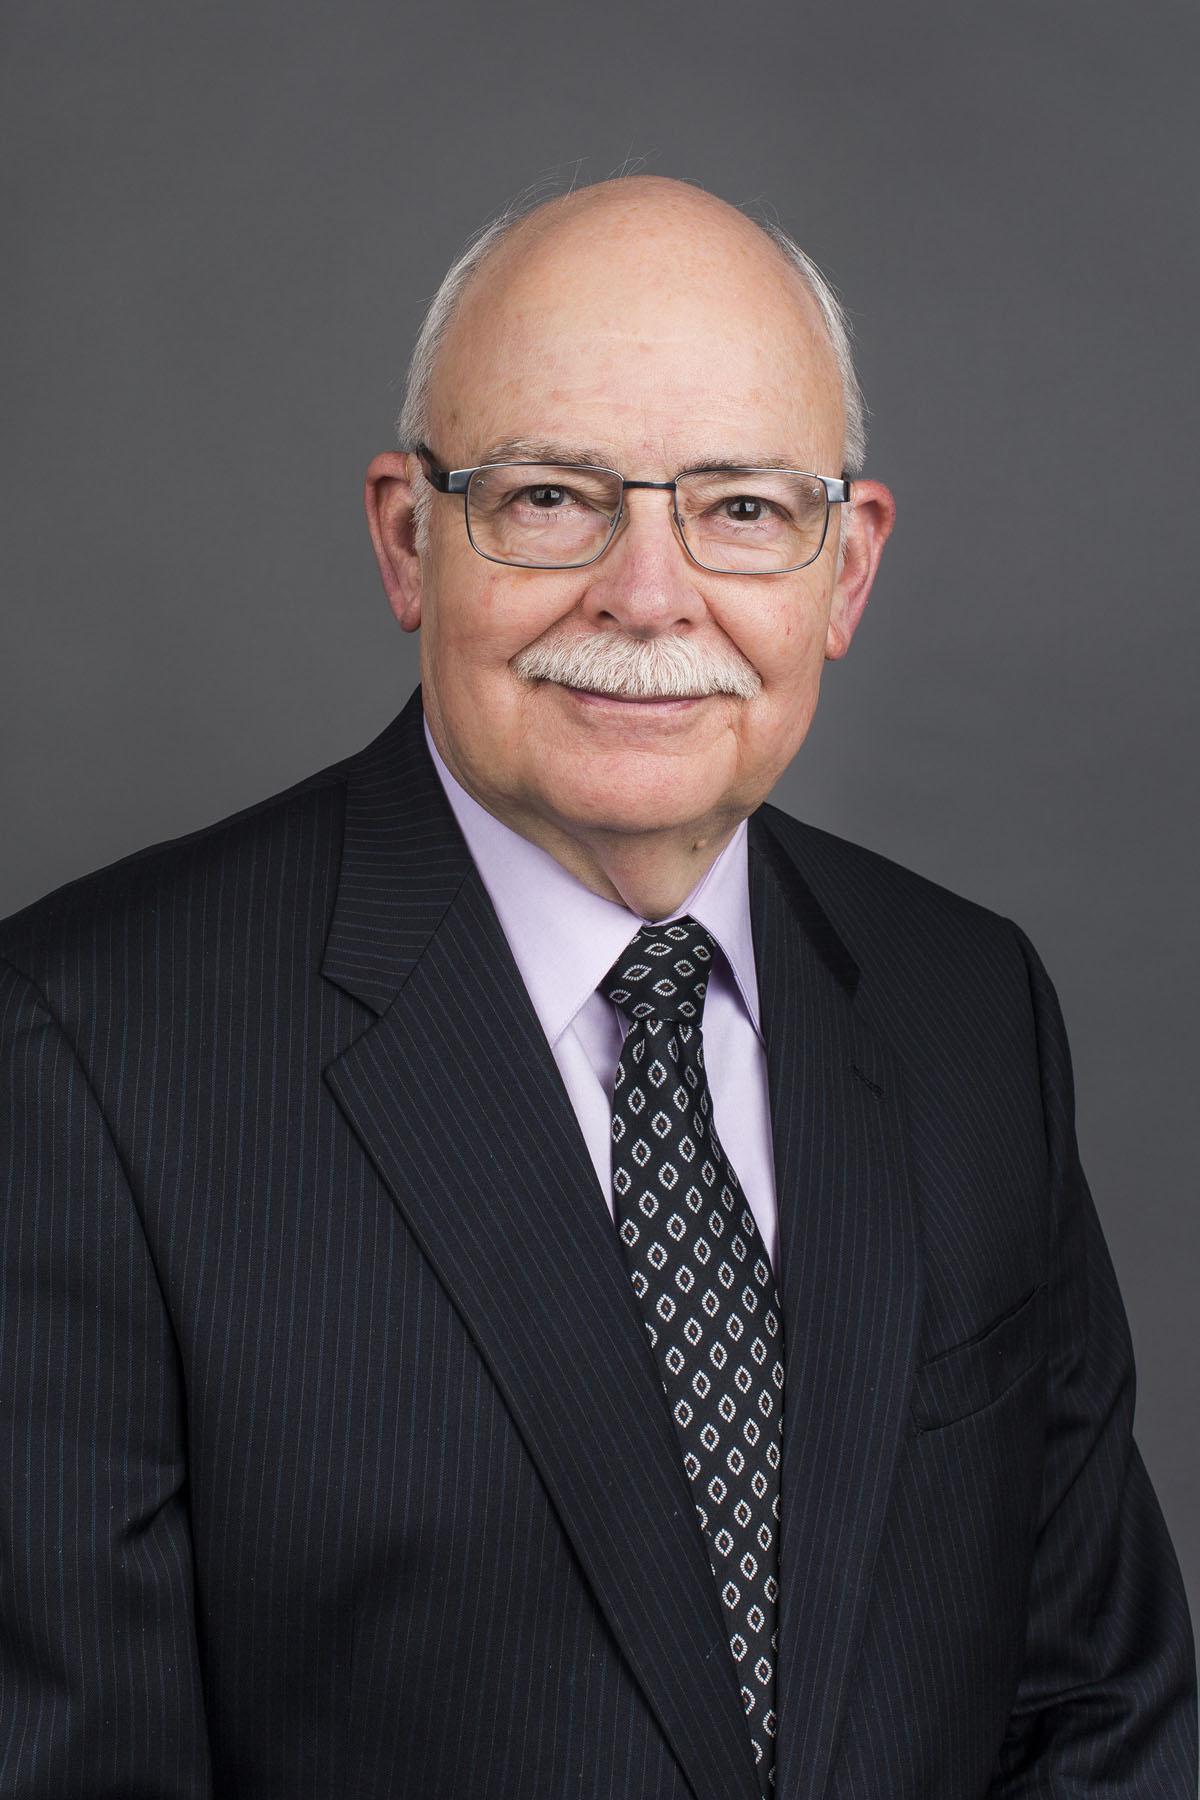 Secretary Alvin Jaeger